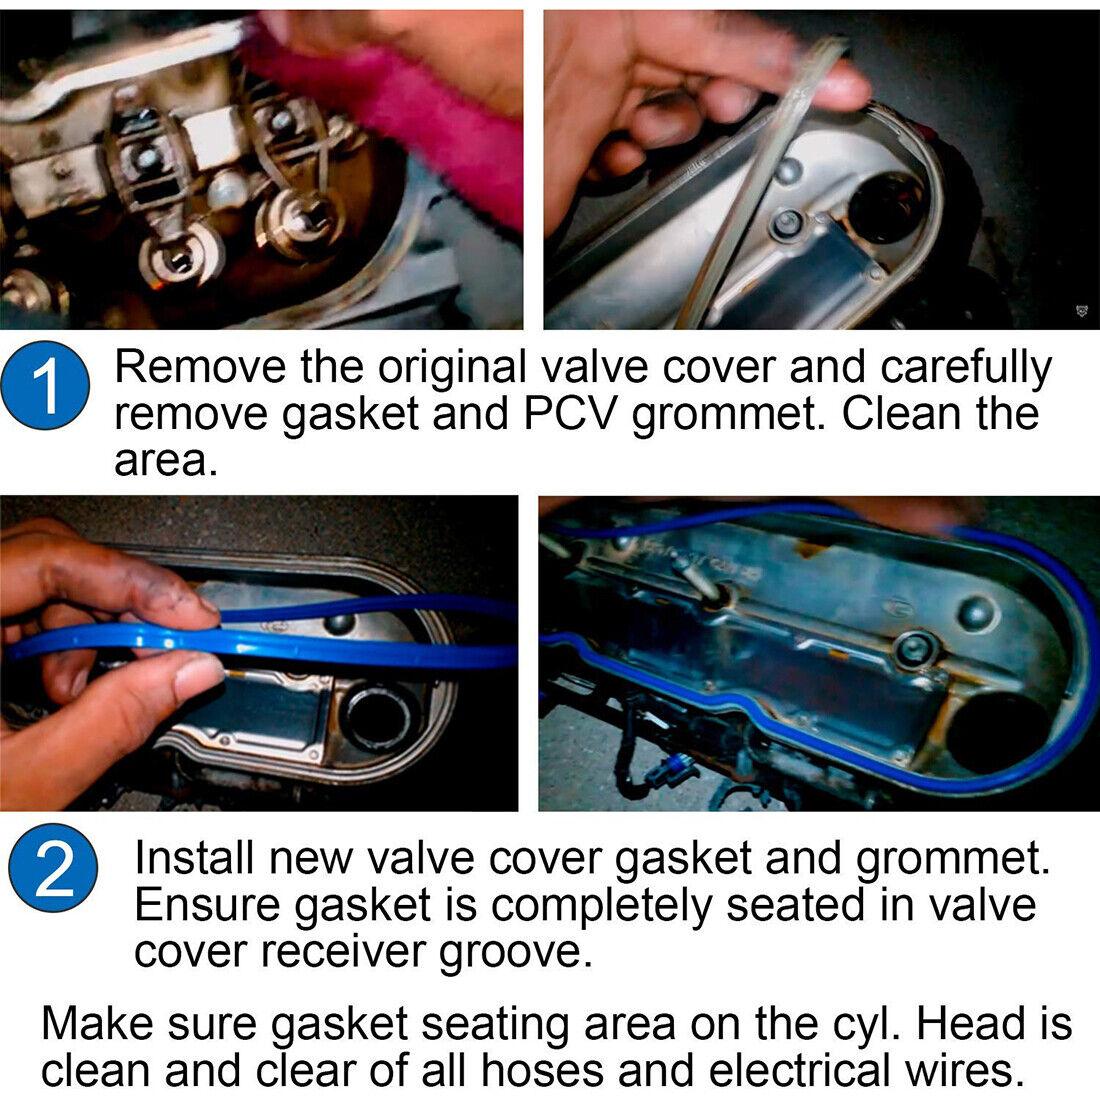 VS50504R1 VS50250A LE-JX Rubber Valve Cover Gasket Set with Grommets Compatible with 1999-2018 GMC Cadillac Chevy Pontiac Buick Hummer 4.8L//5.3L//6.0L//6.2L//7.0L Valve Covers